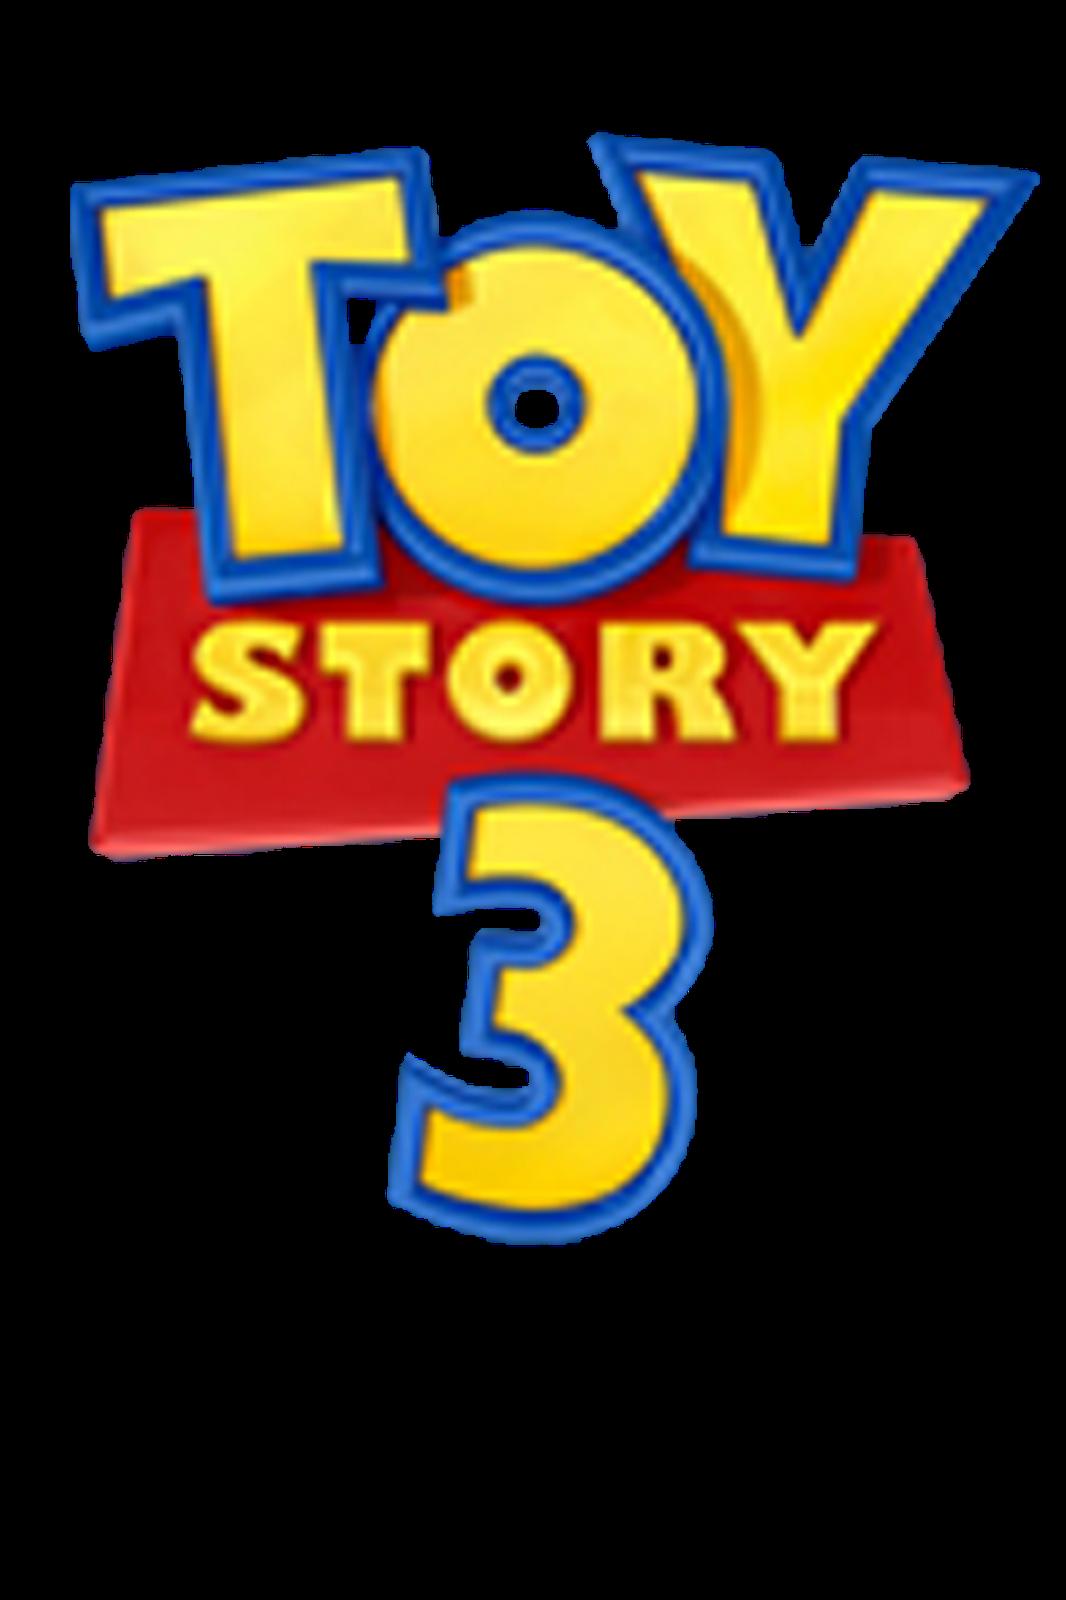 Logotípos de Toy Story para personalizar - Imagui